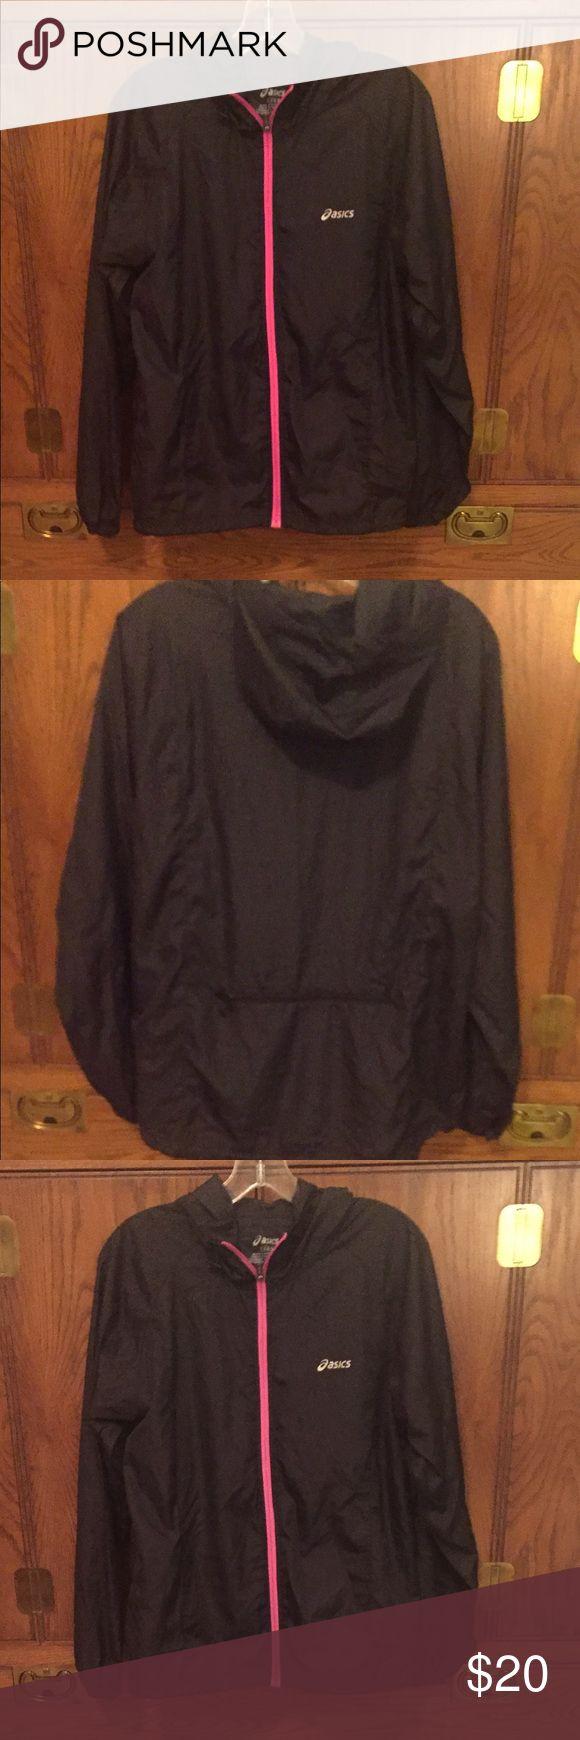 ❤️BLACK w/ HotPink Windbreaker Size Large by Oasis NWOT. 100% Polyester Oasis Jackets & Coats